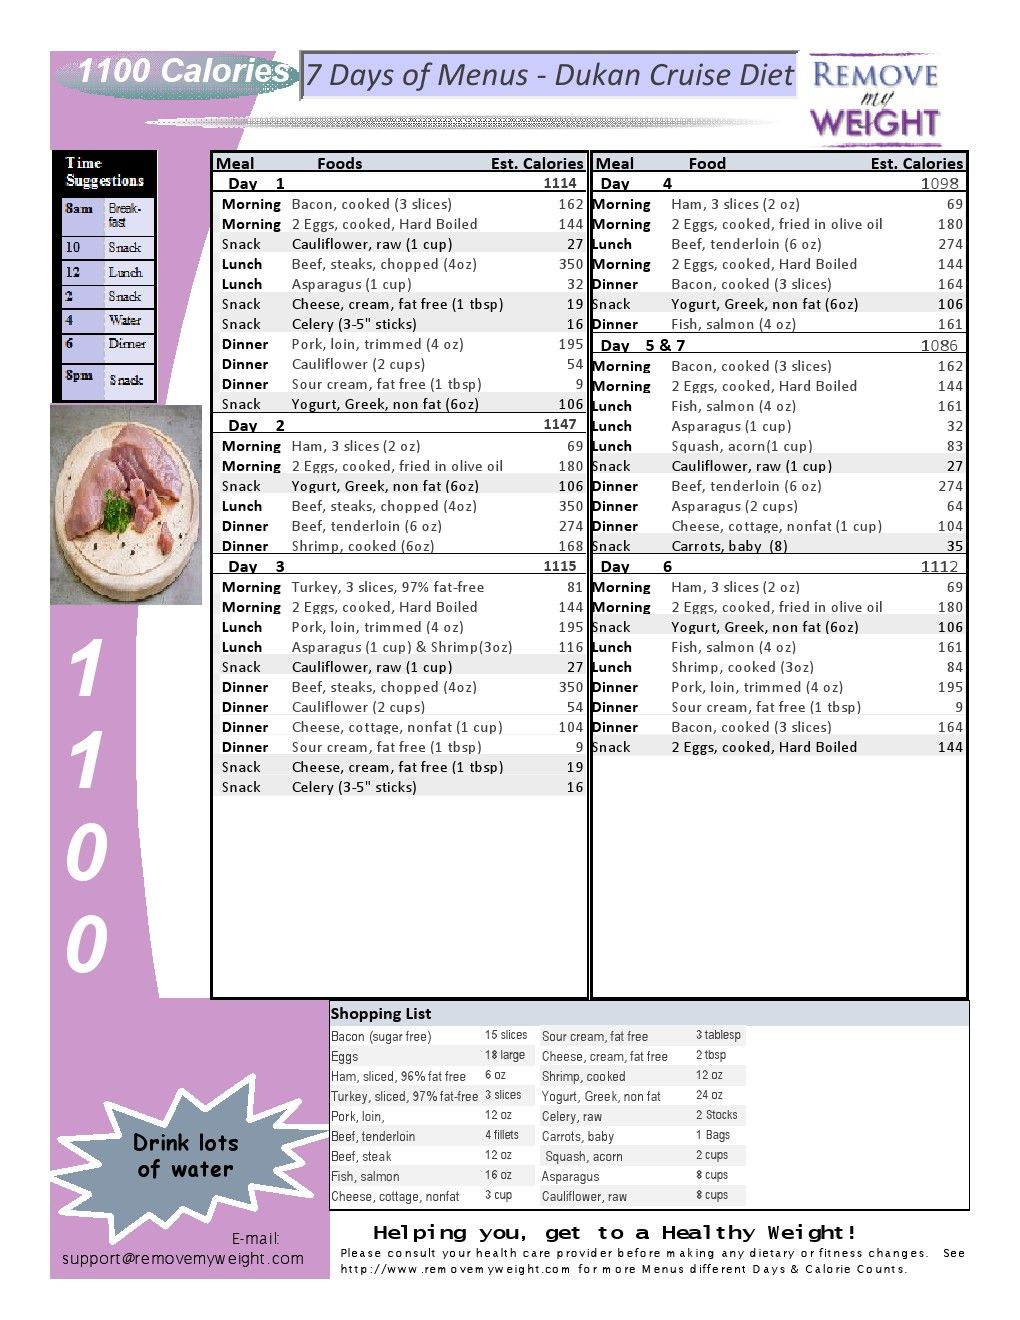 Printable - 1 Week 1100 Calorie Menu Plan - Dukan Diet